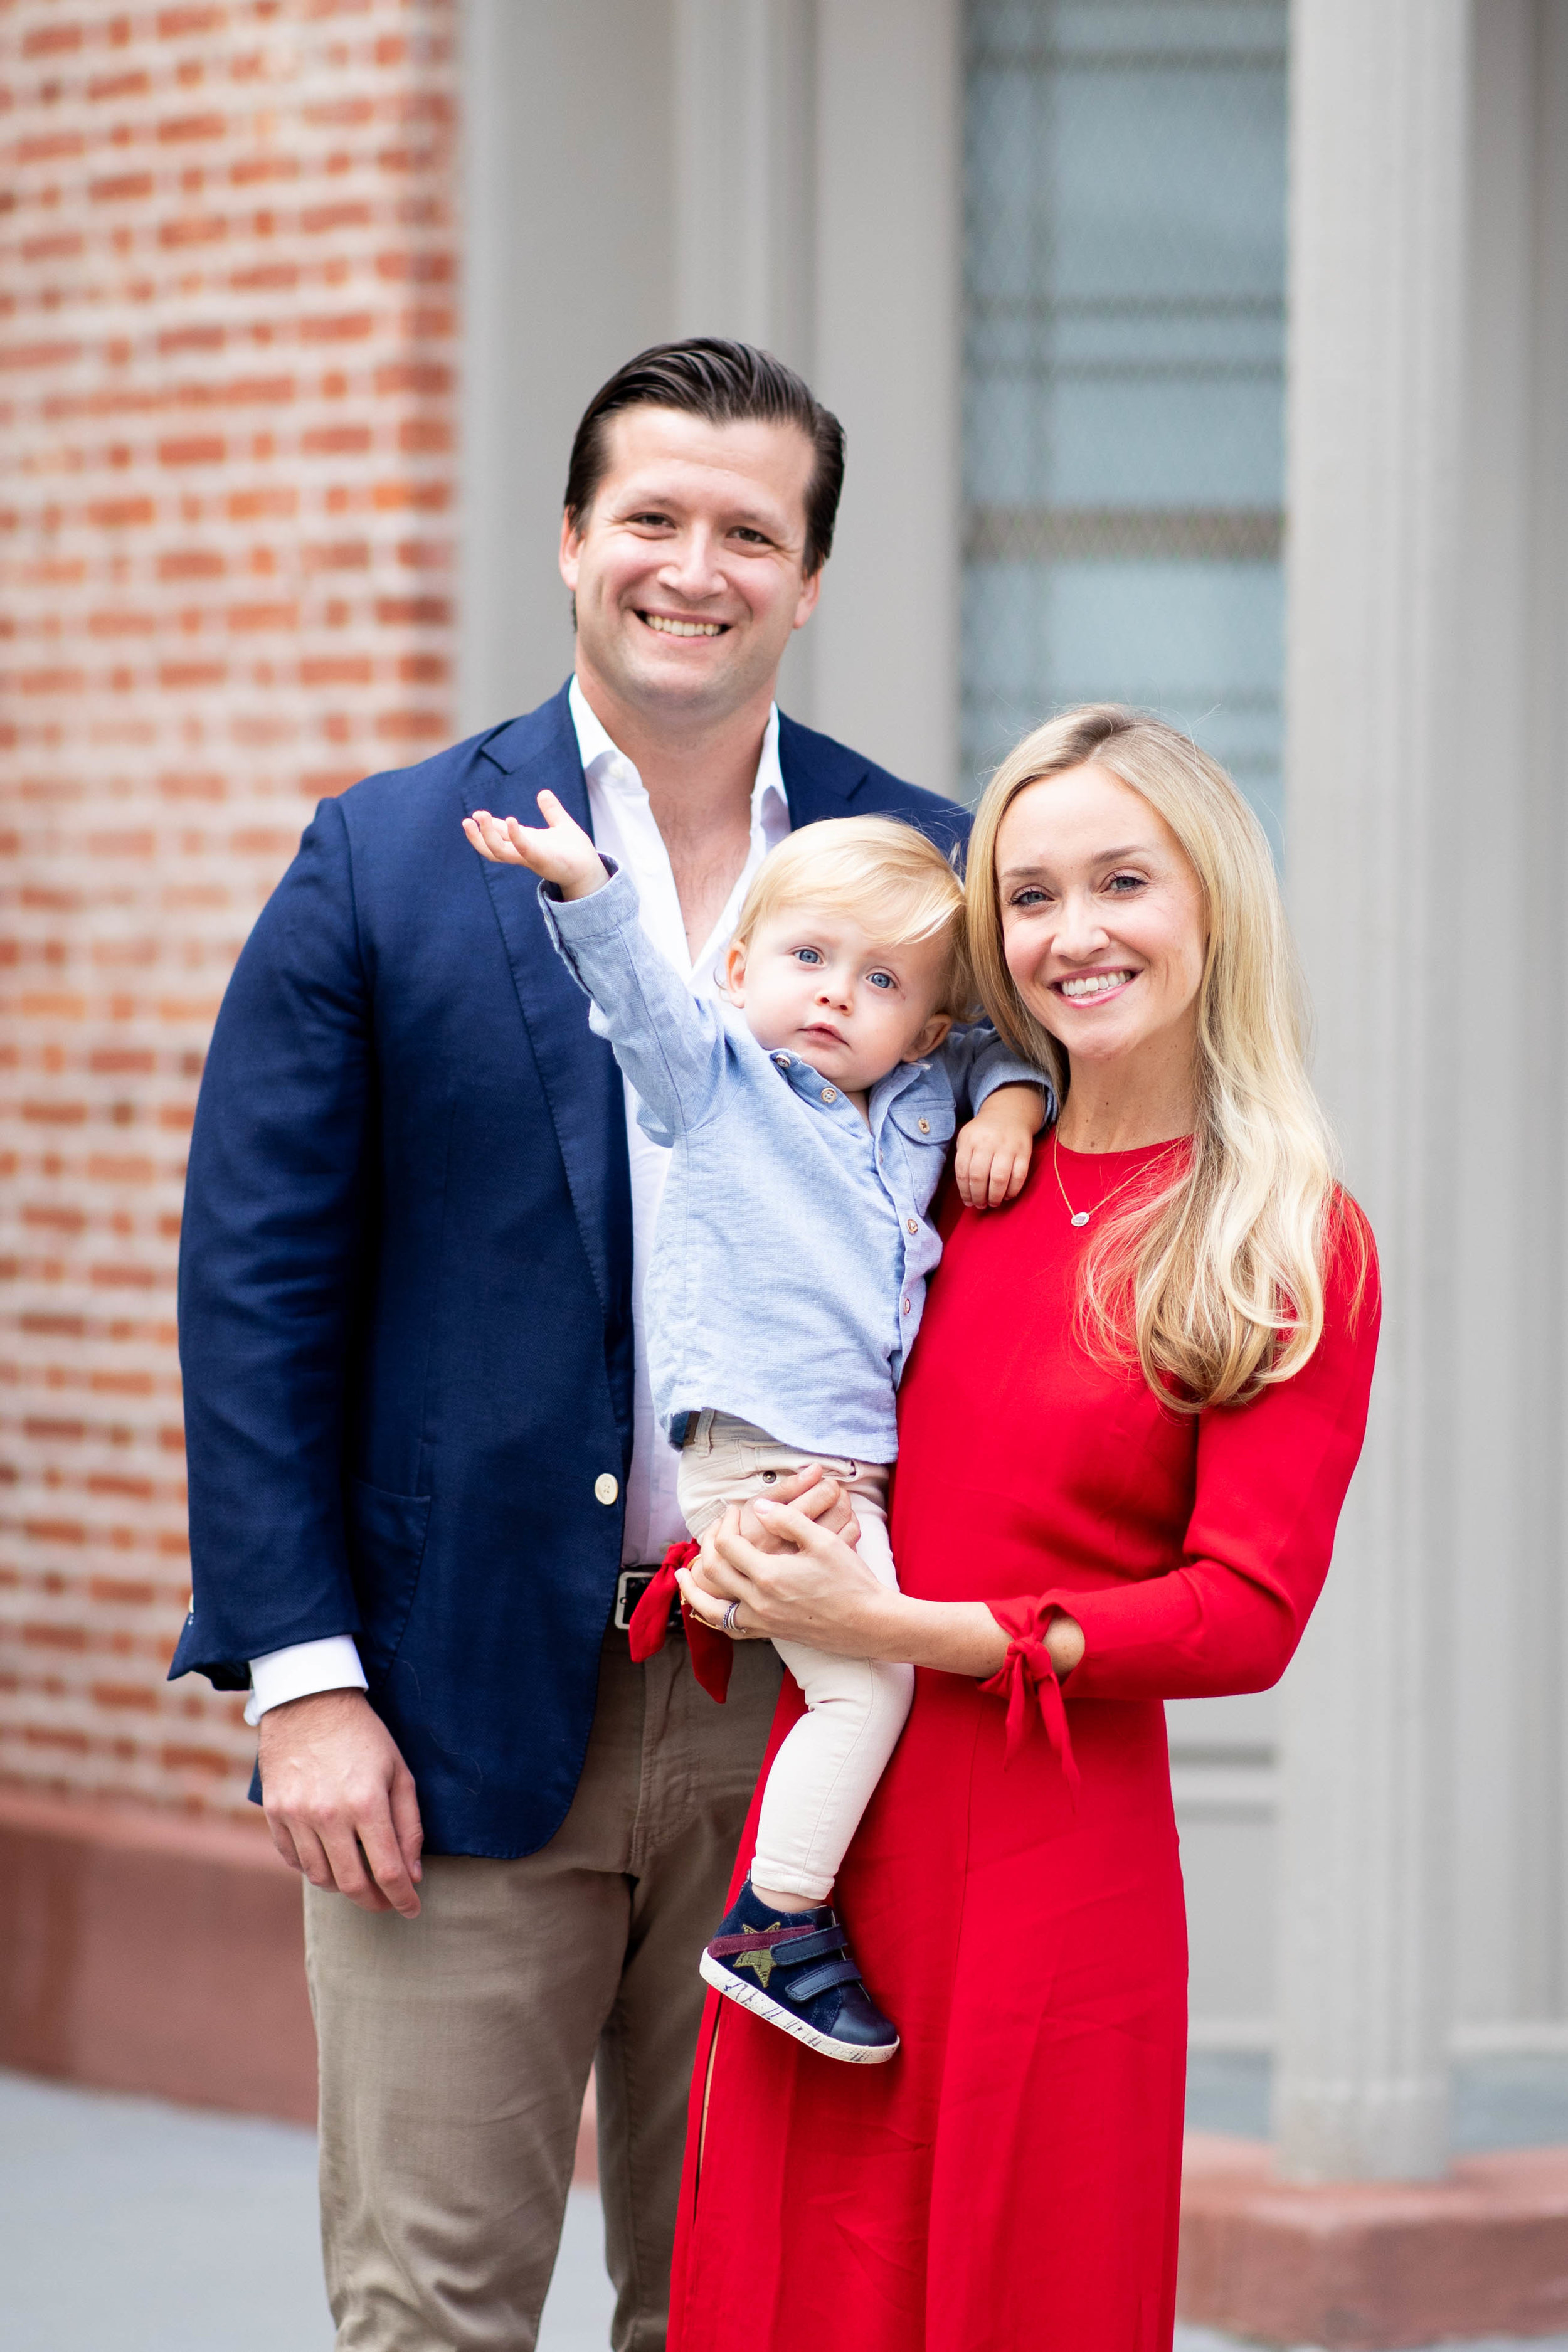 Posing Tips for Family Photos this Holiday Season -